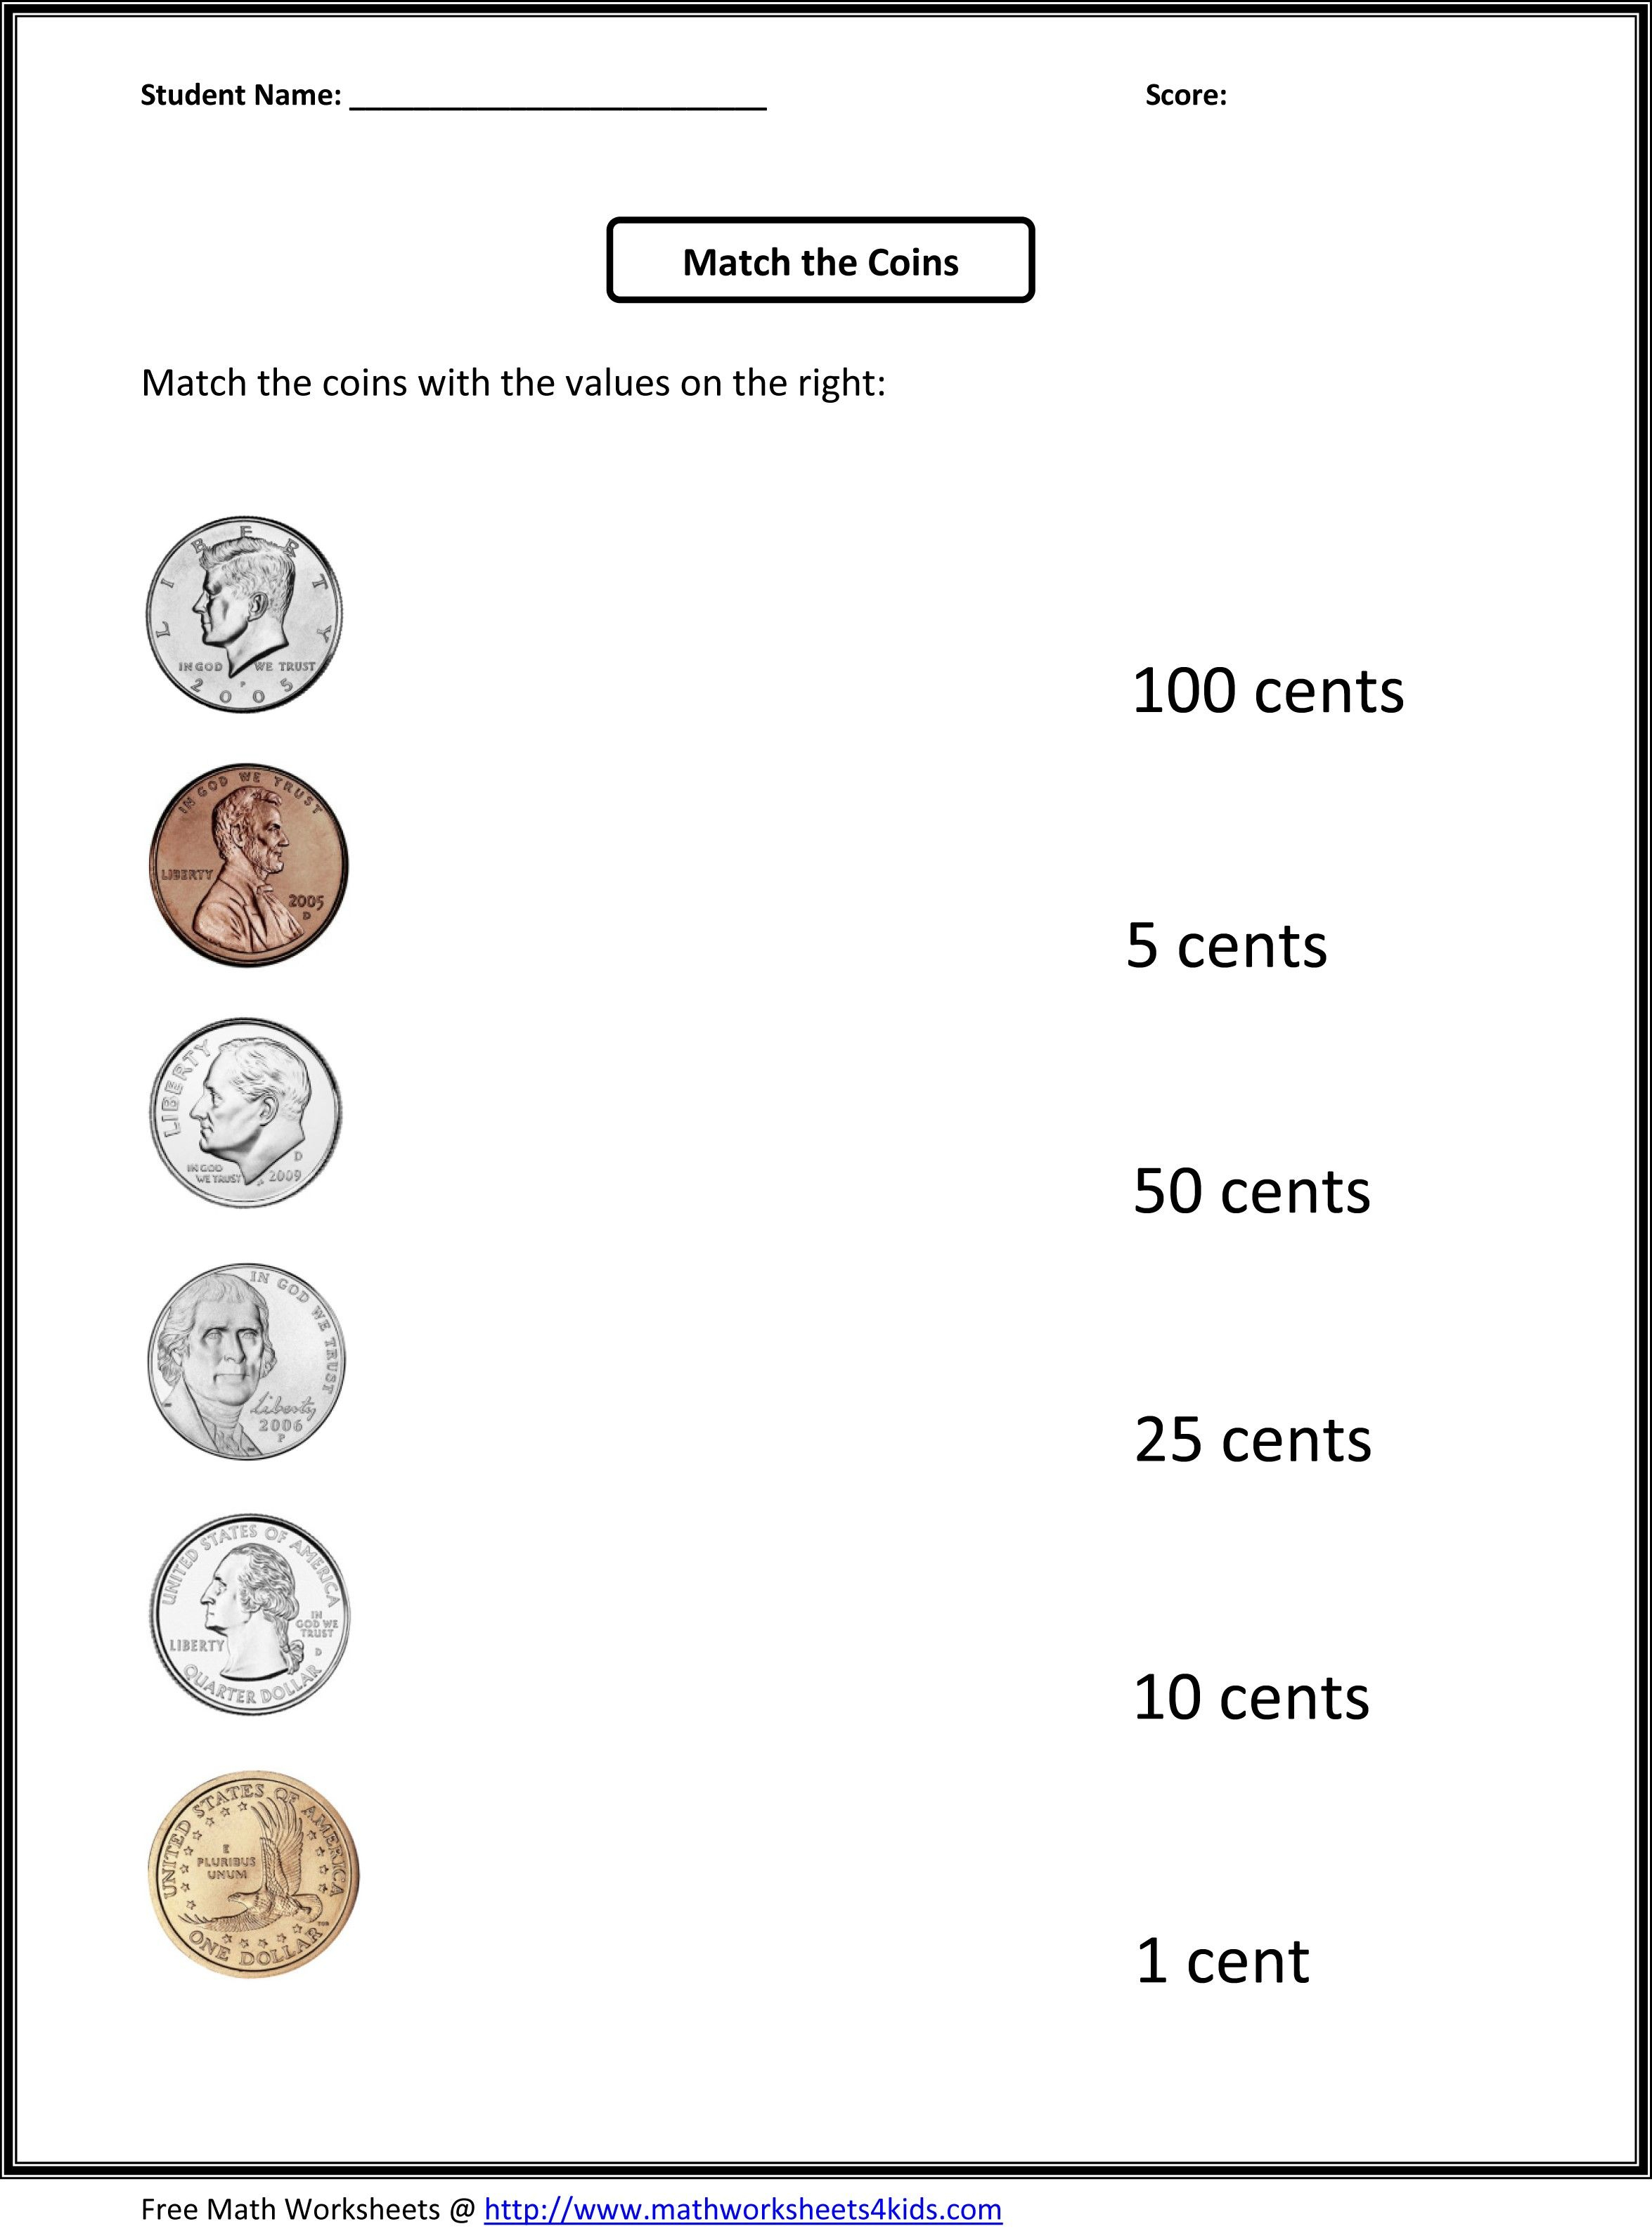 First Grade Money Worksheets Free Printable | Education (For The - Free Printable Money Worksheets For 1St Grade